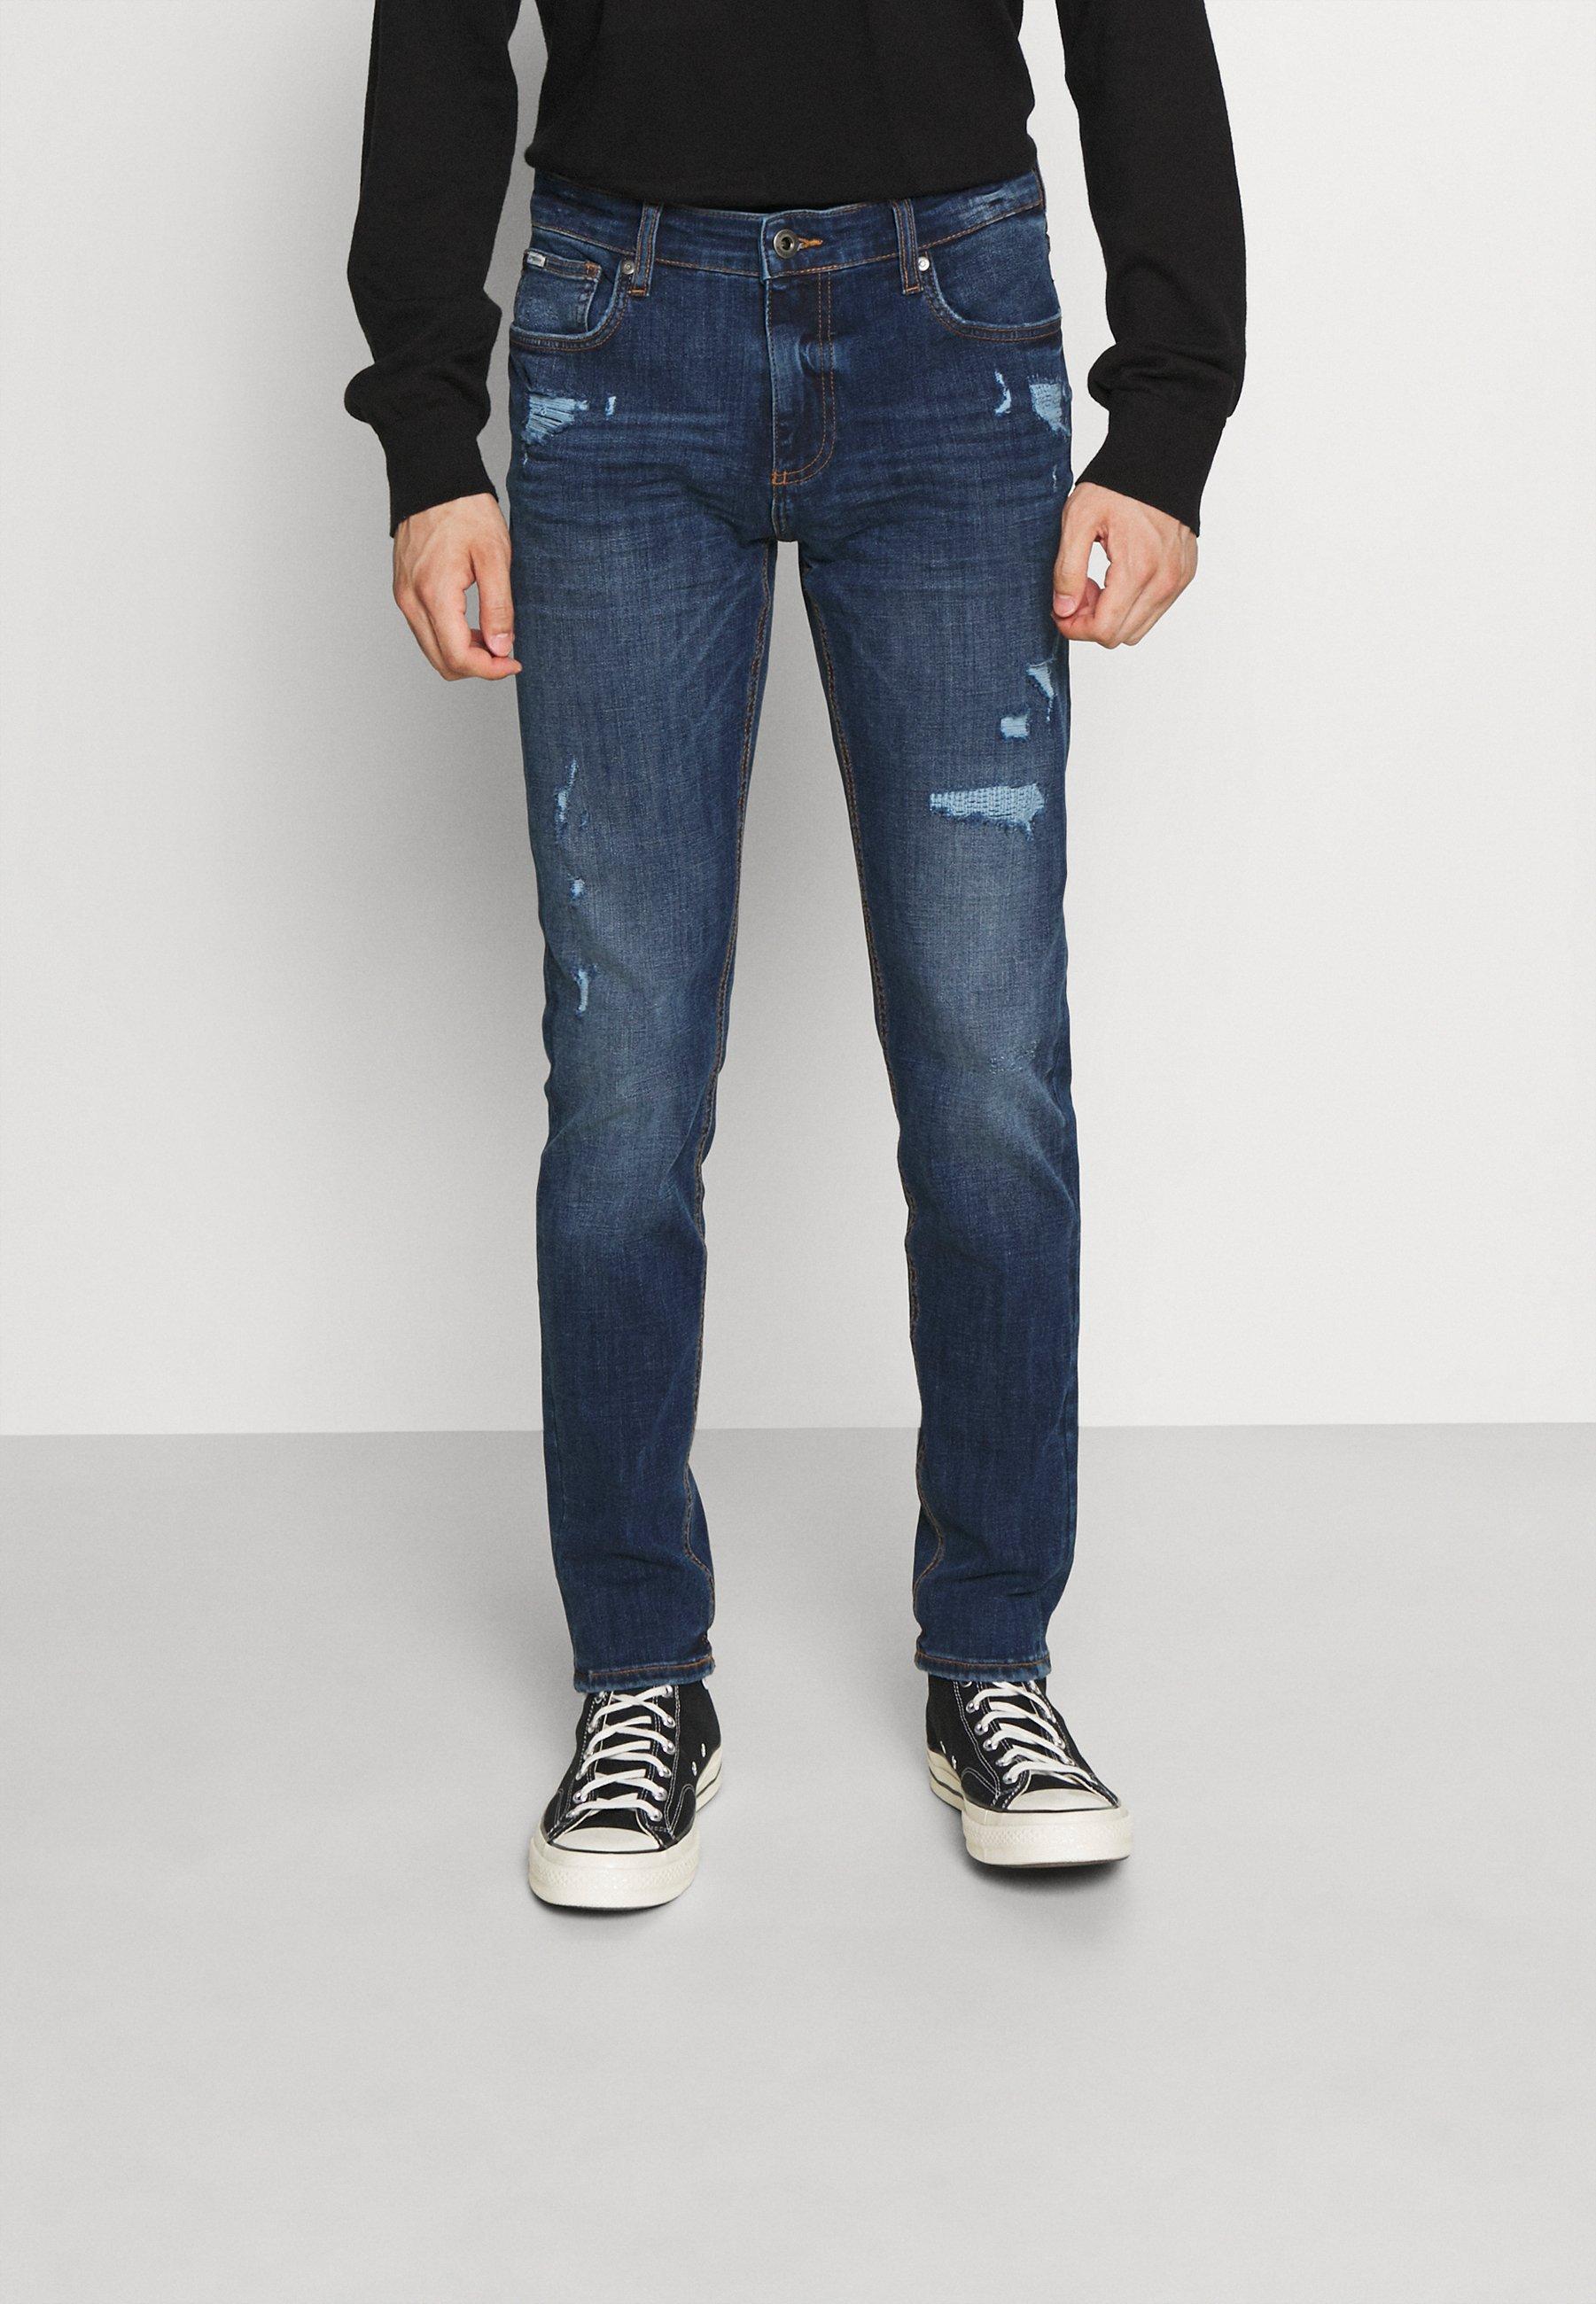 Uomo SUPERFLEX WITH DESTROY - Jeans slim fit